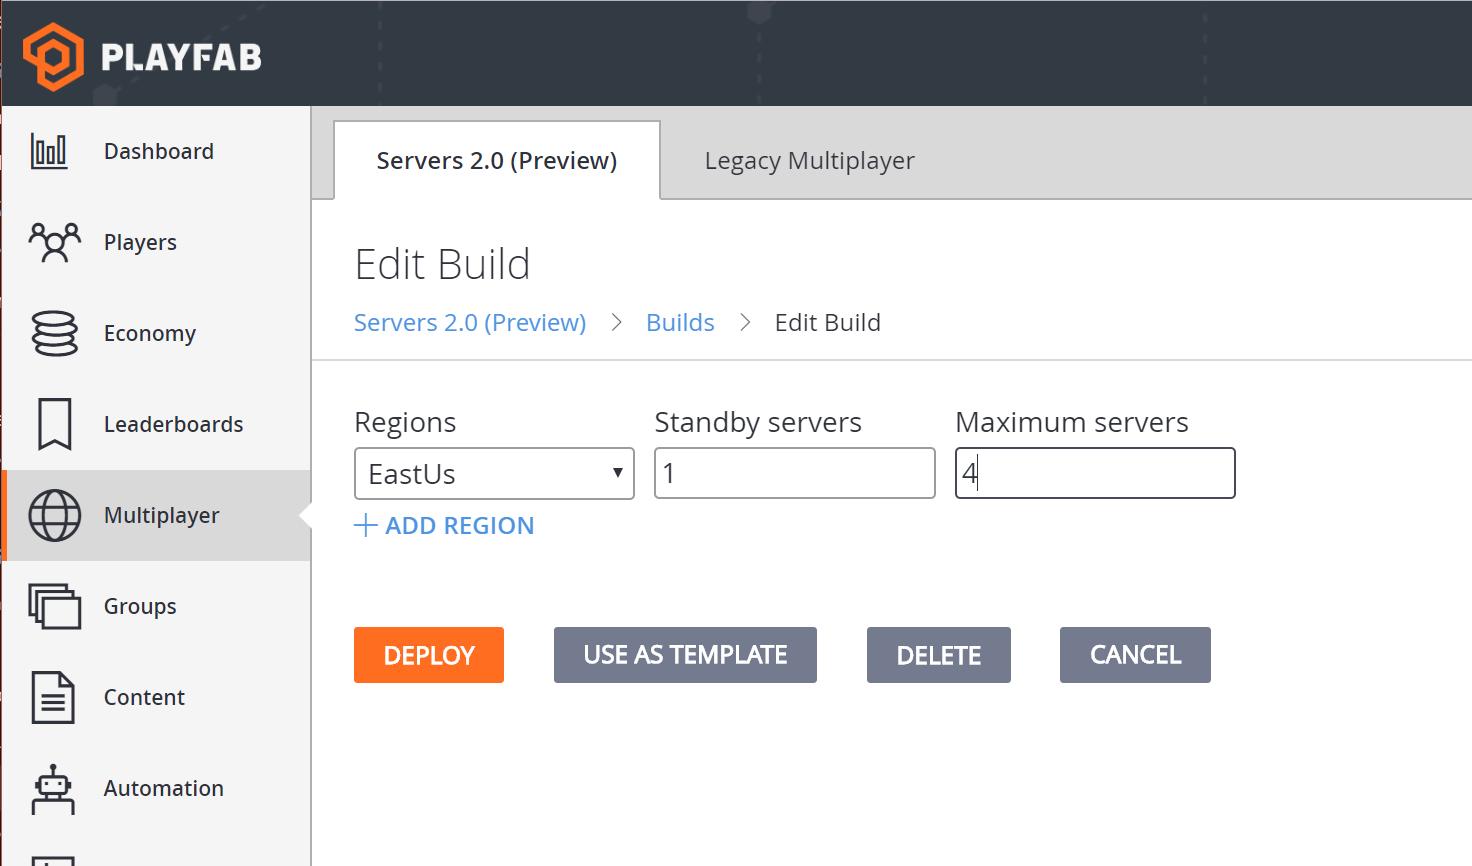 Quickstart for multiplayer servers (Game Manager) - PlayFab